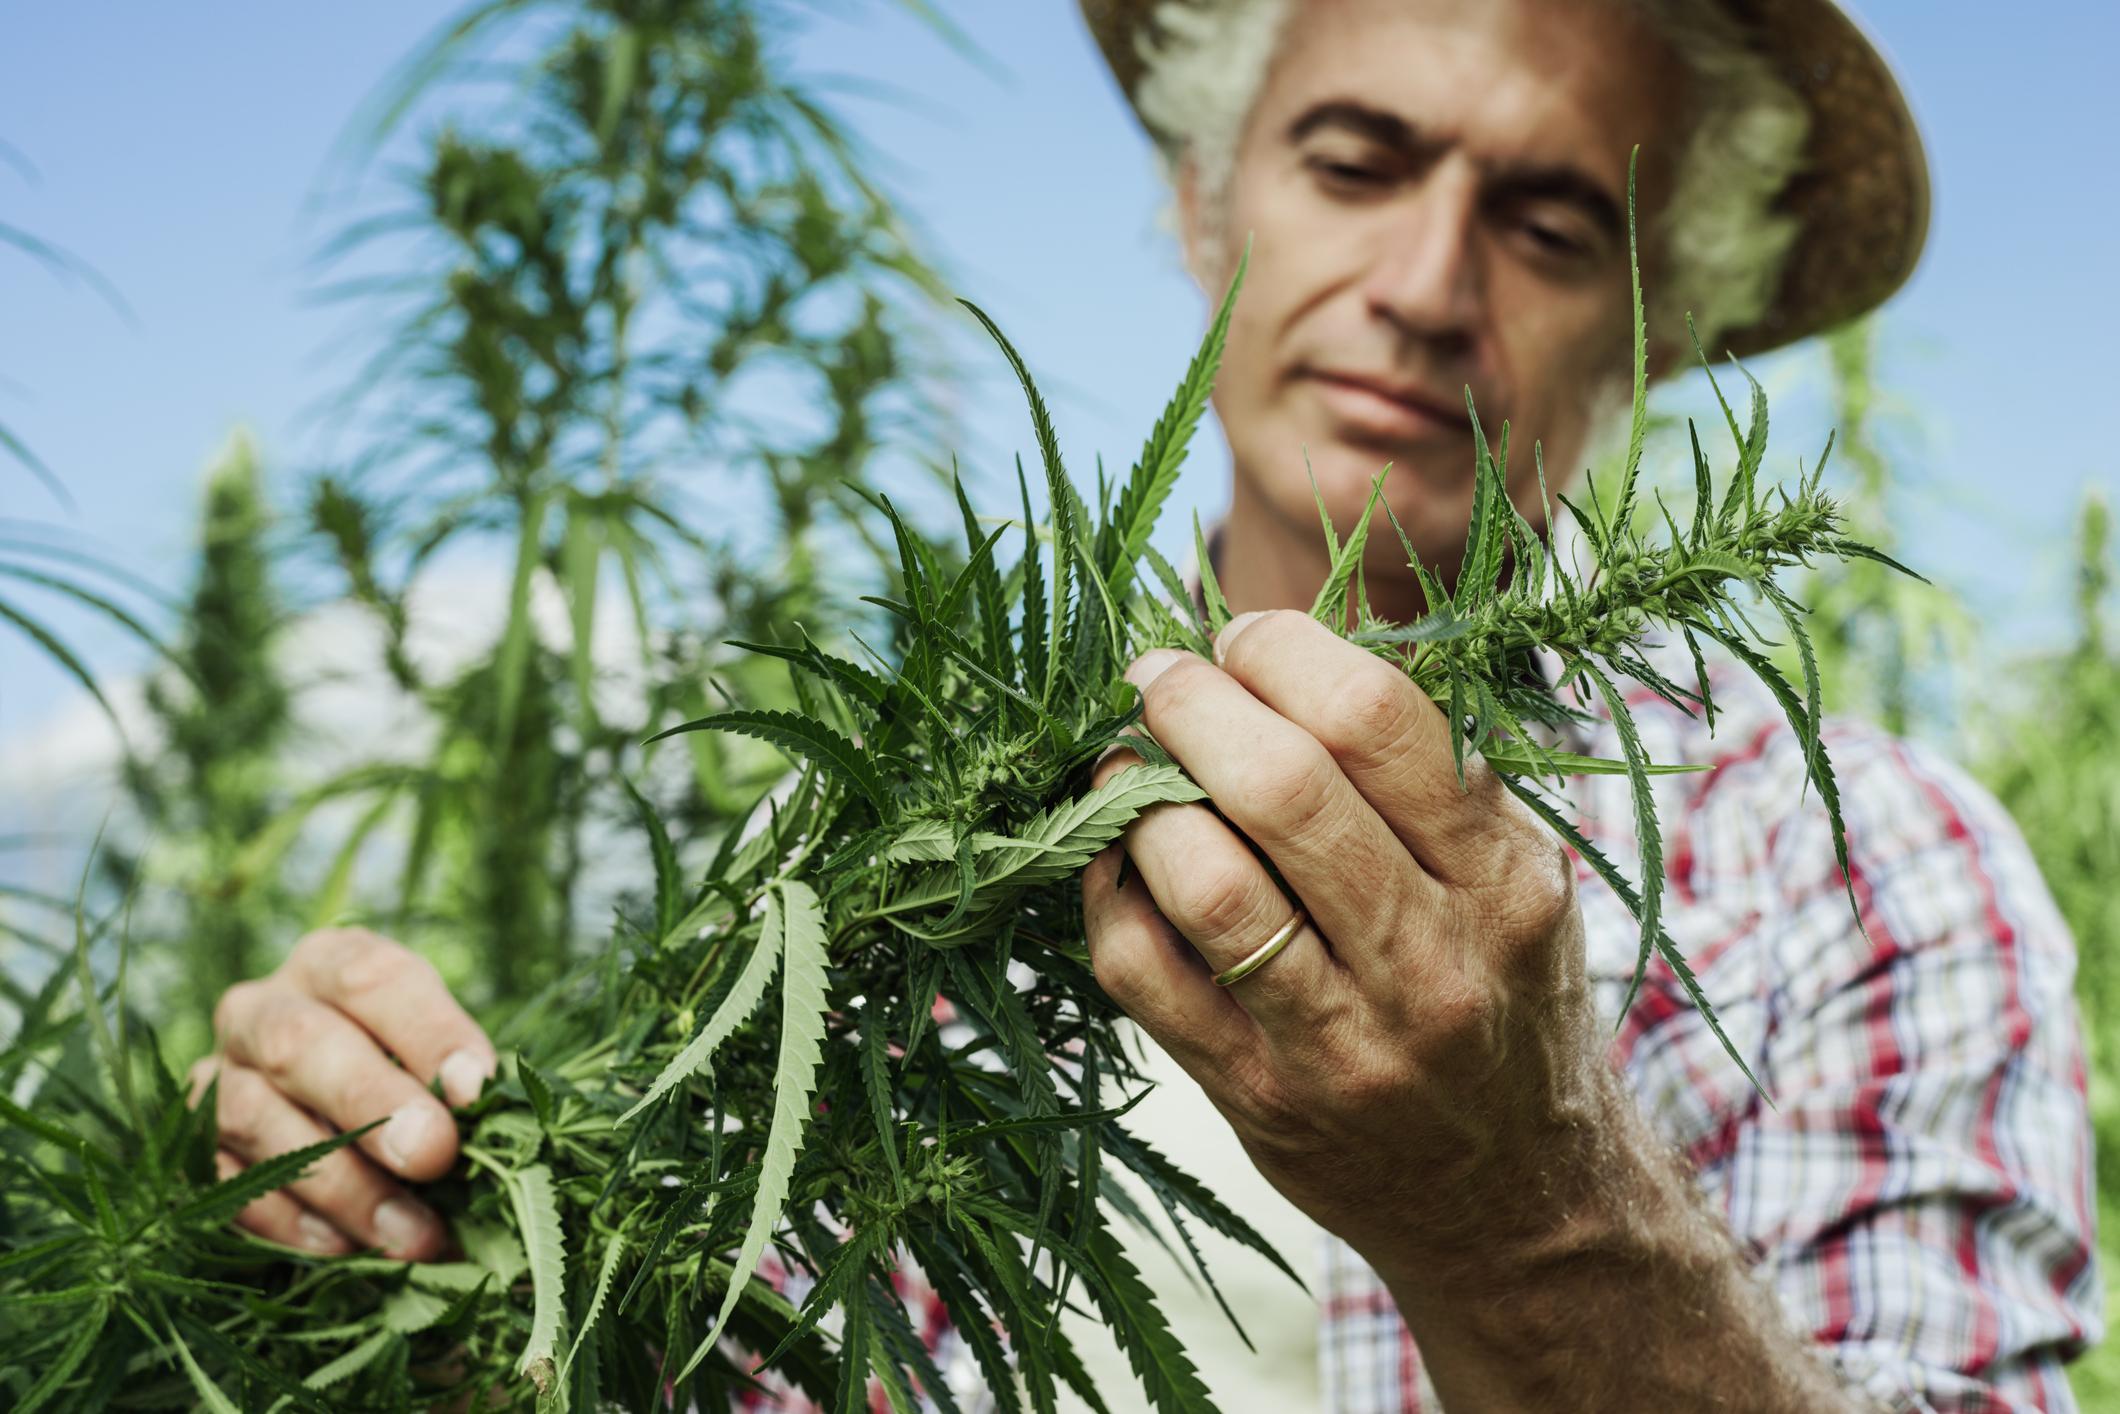 A hemp farmer in a hat,  pruning his crop.